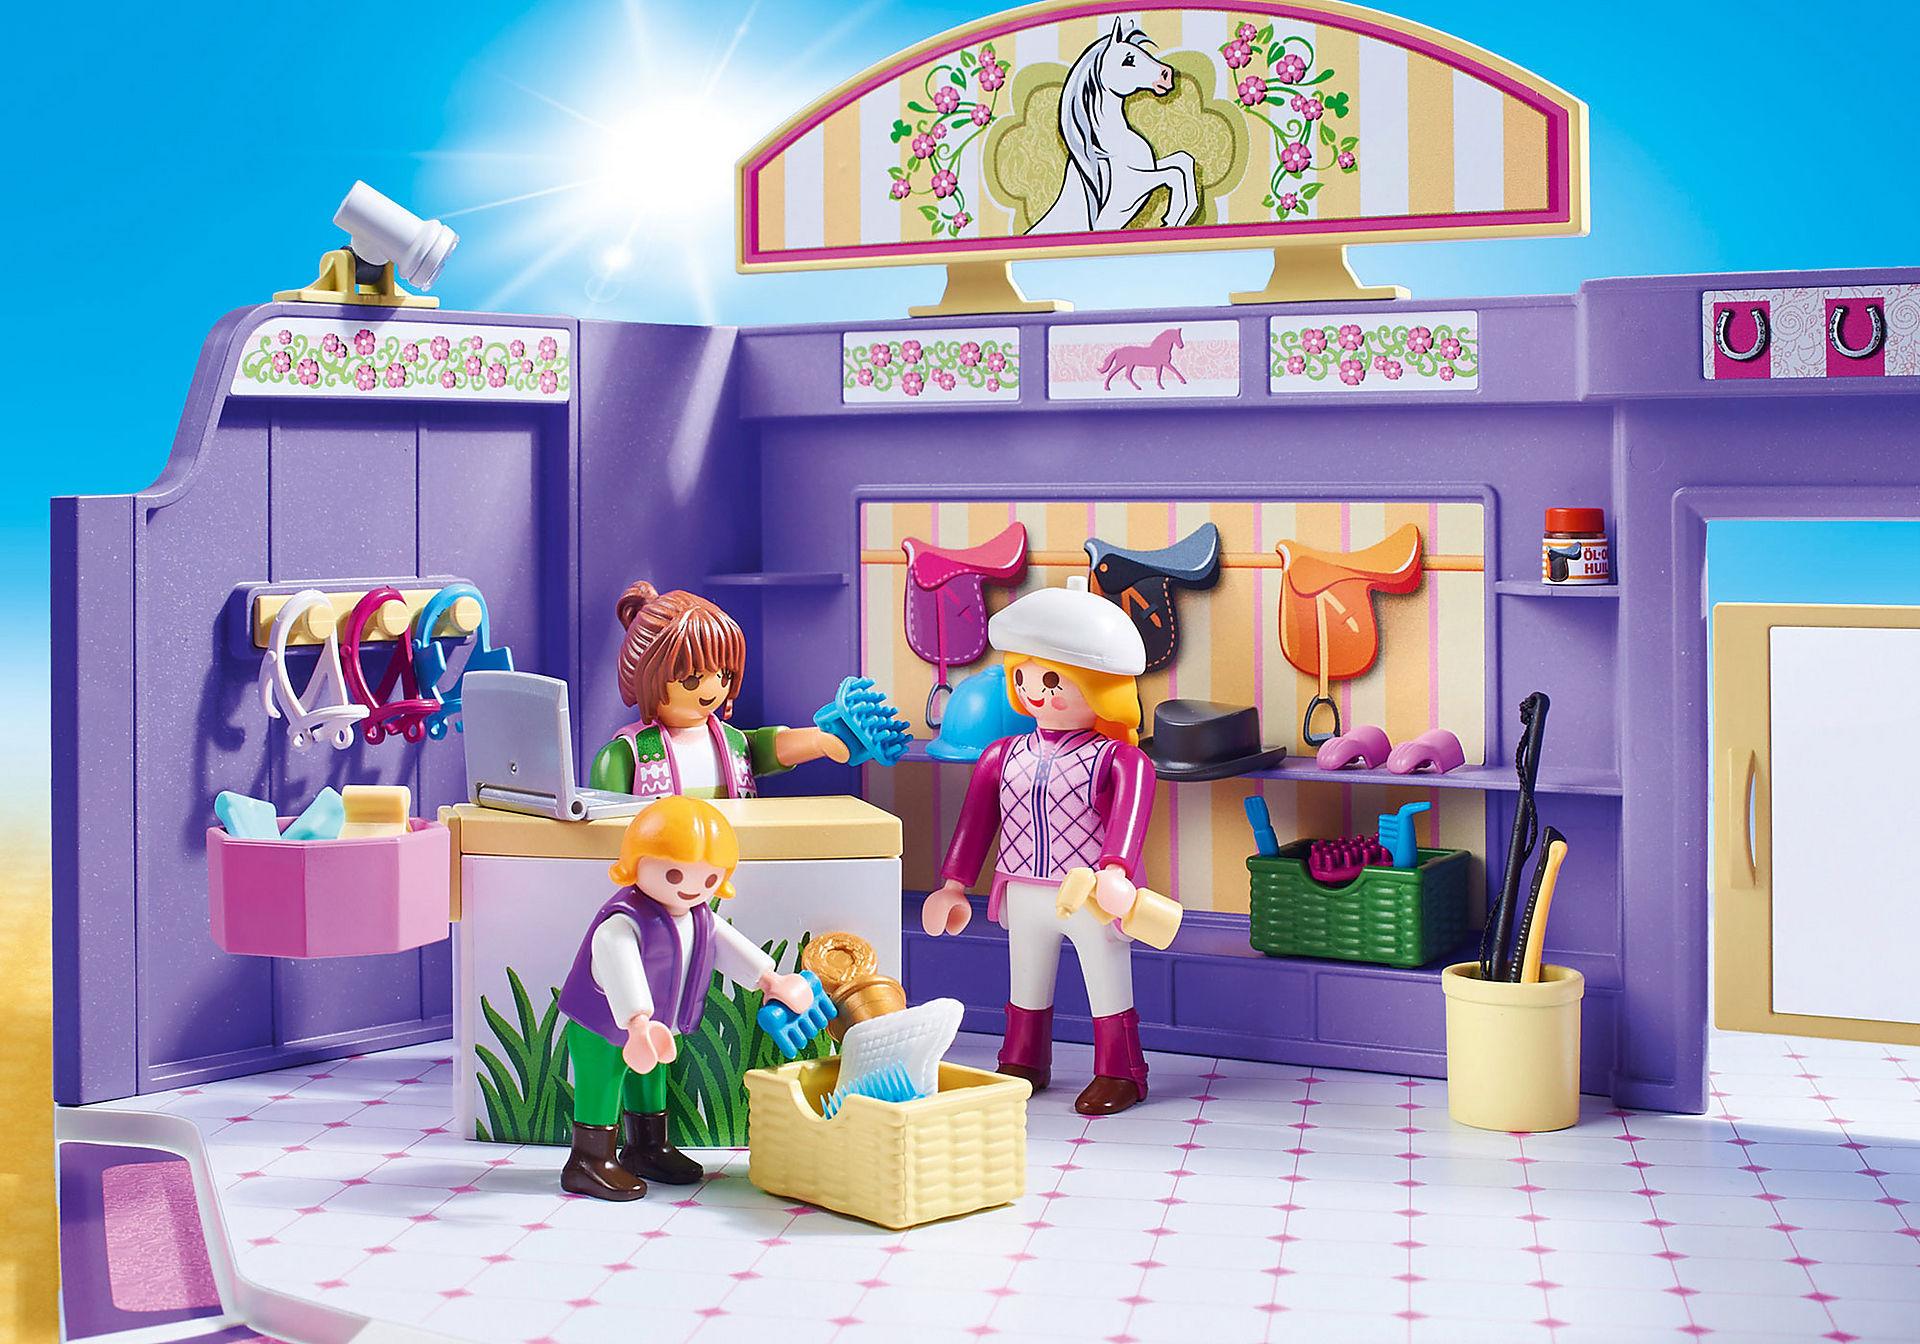 http://media.playmobil.com/i/playmobil/9401_product_extra1/Rideudstyrsbutik